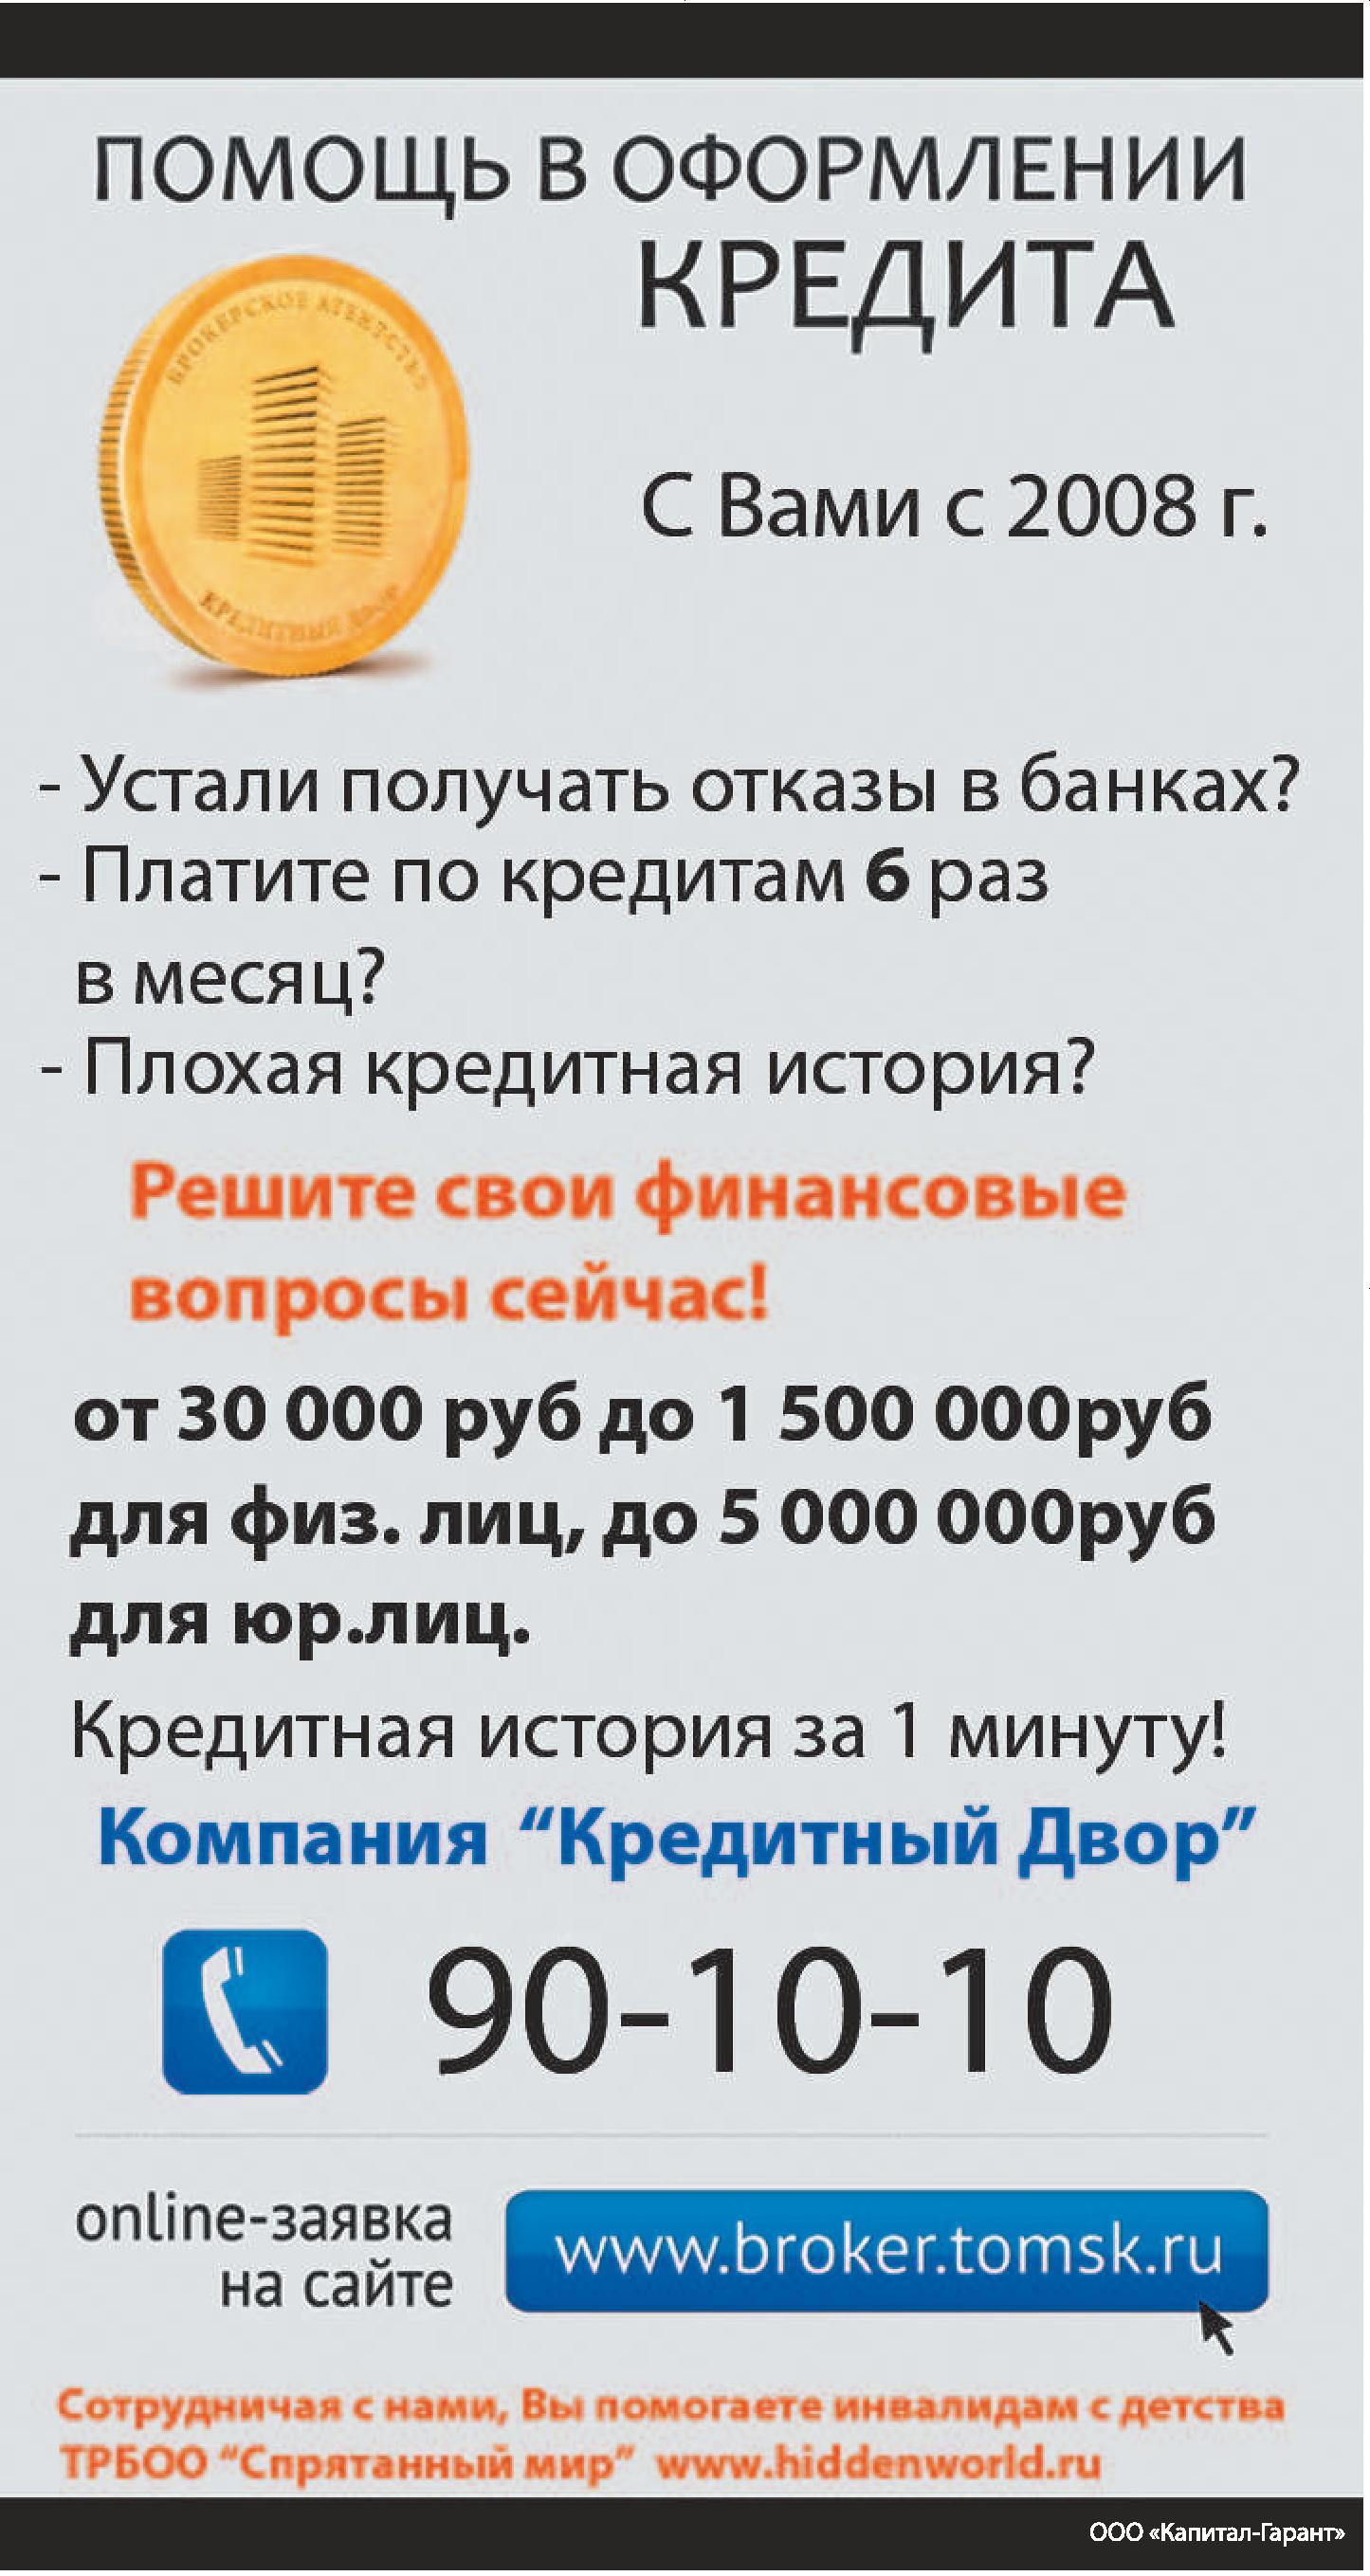 Форум по валютному контролю